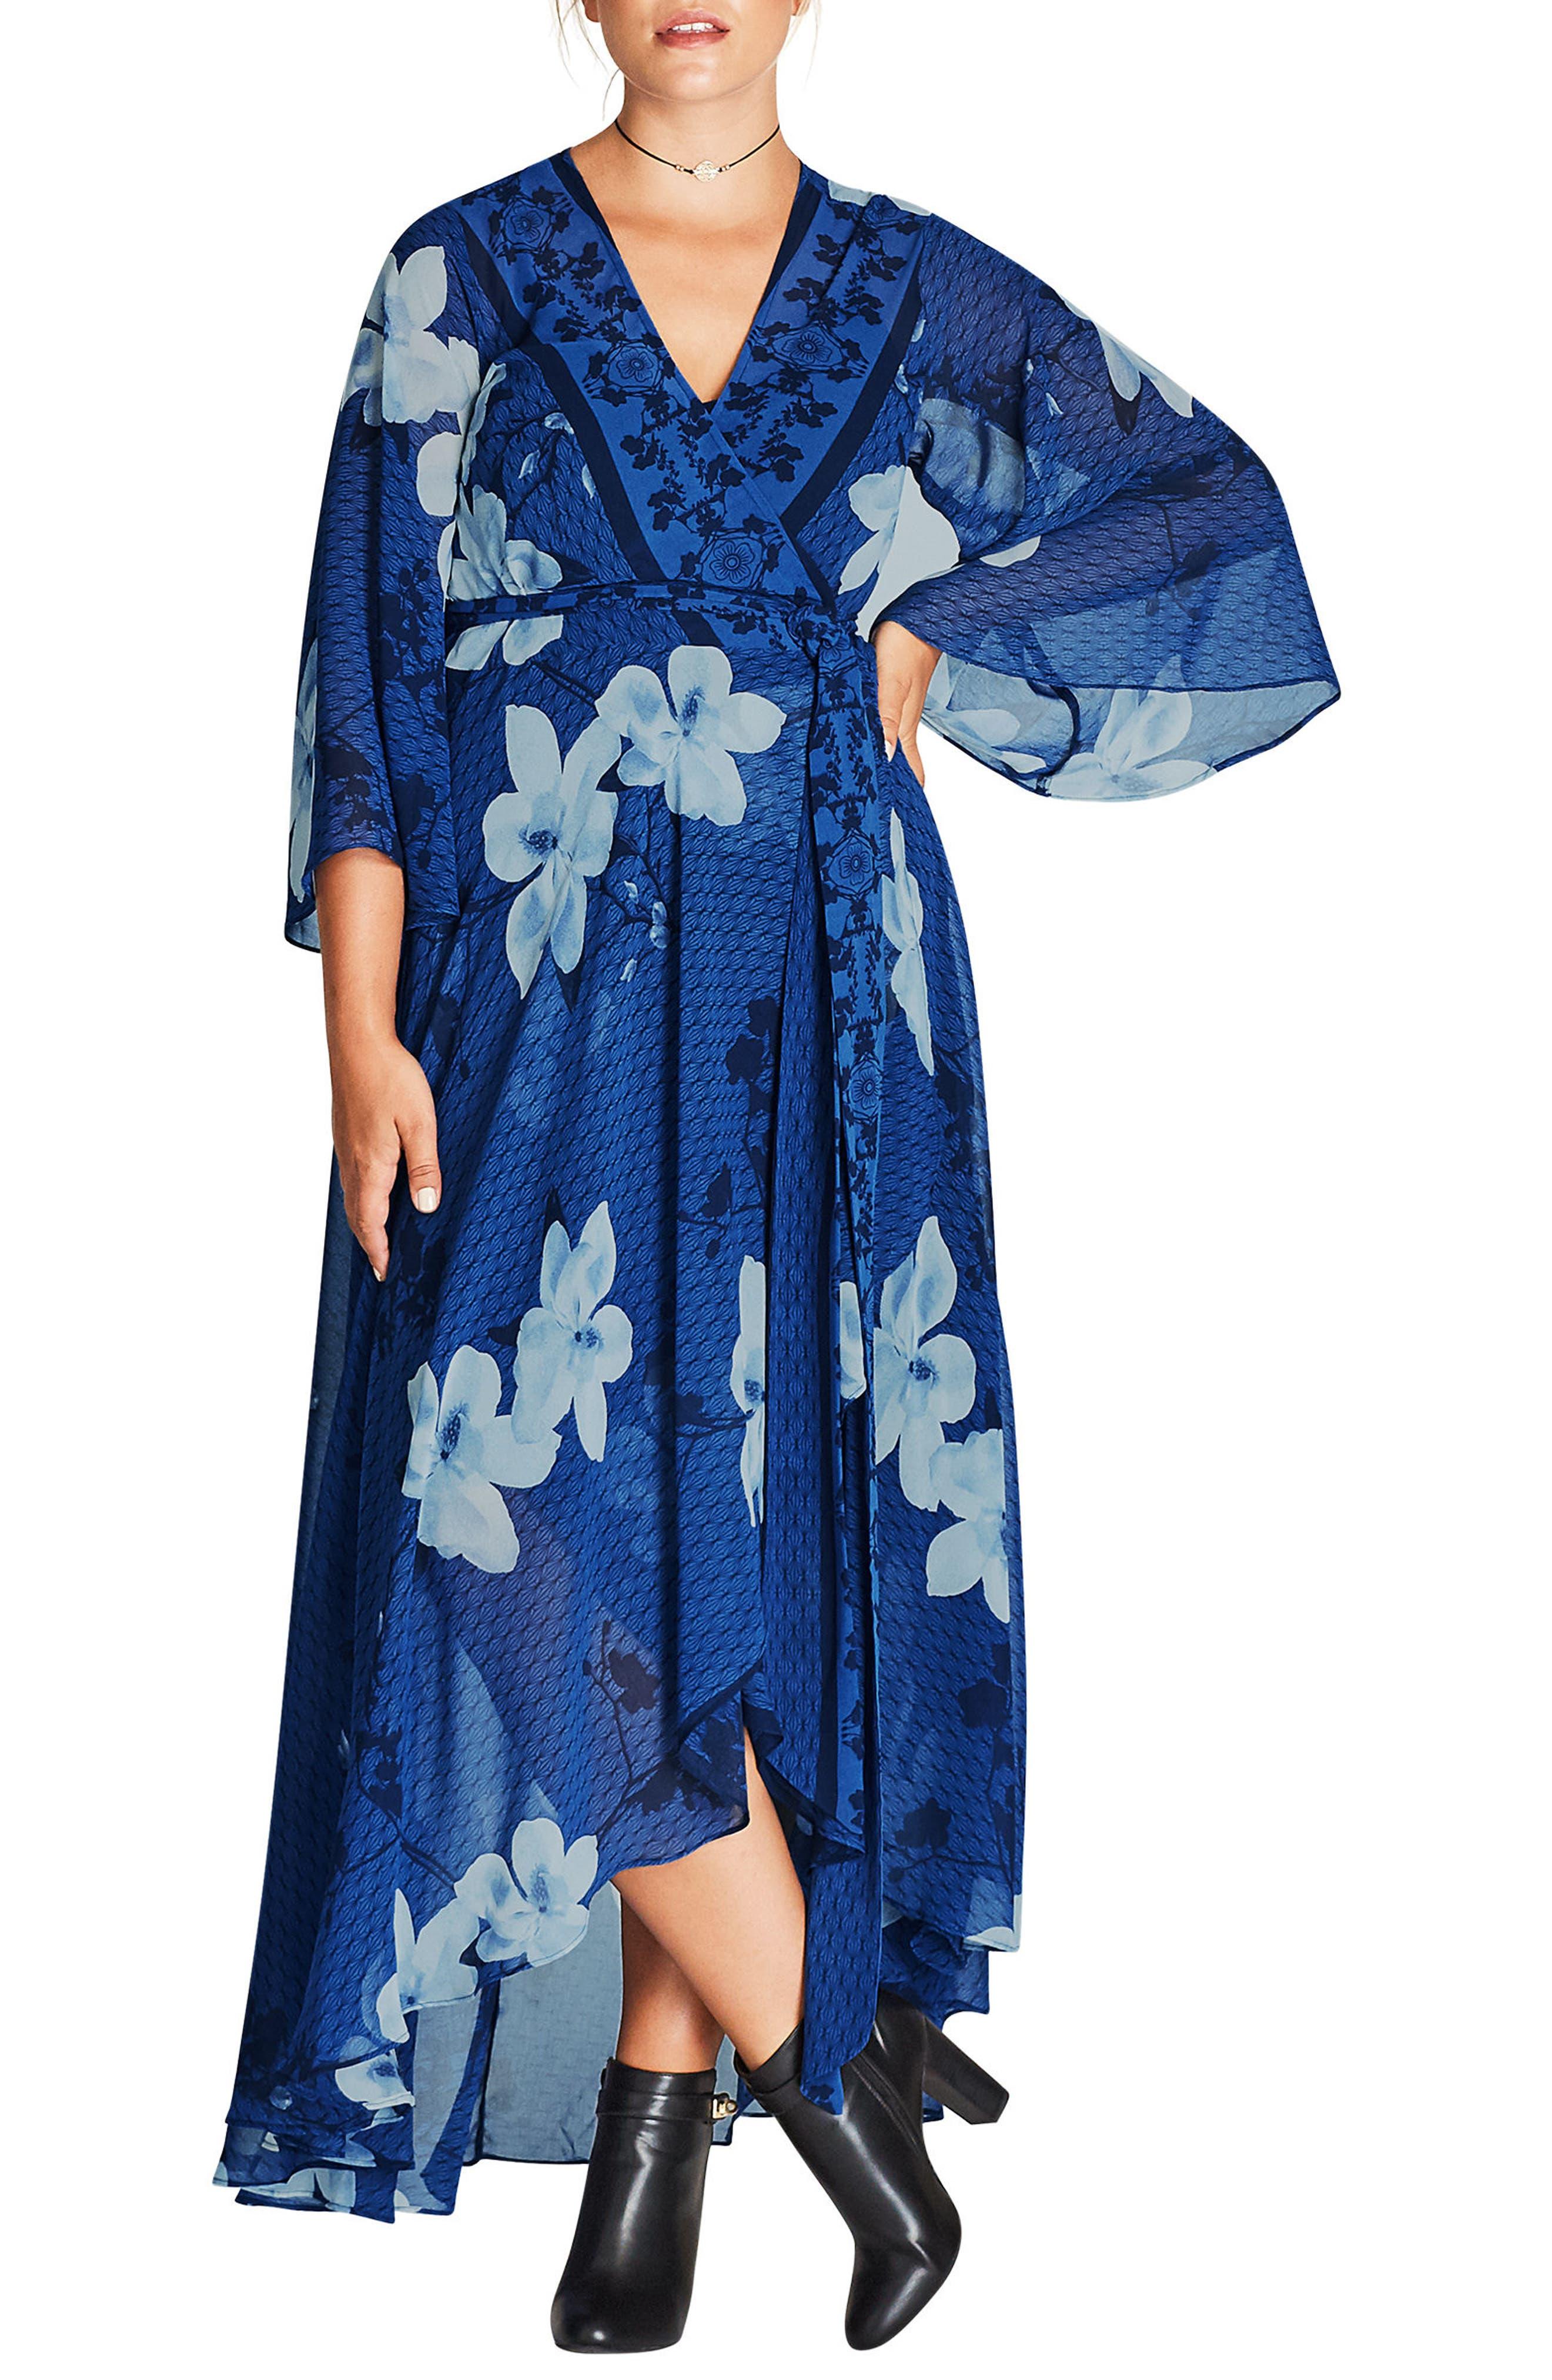 Blue Magnolia Maxi Wrap Dress,                             Main thumbnail 1, color,                             Blue Magnolia